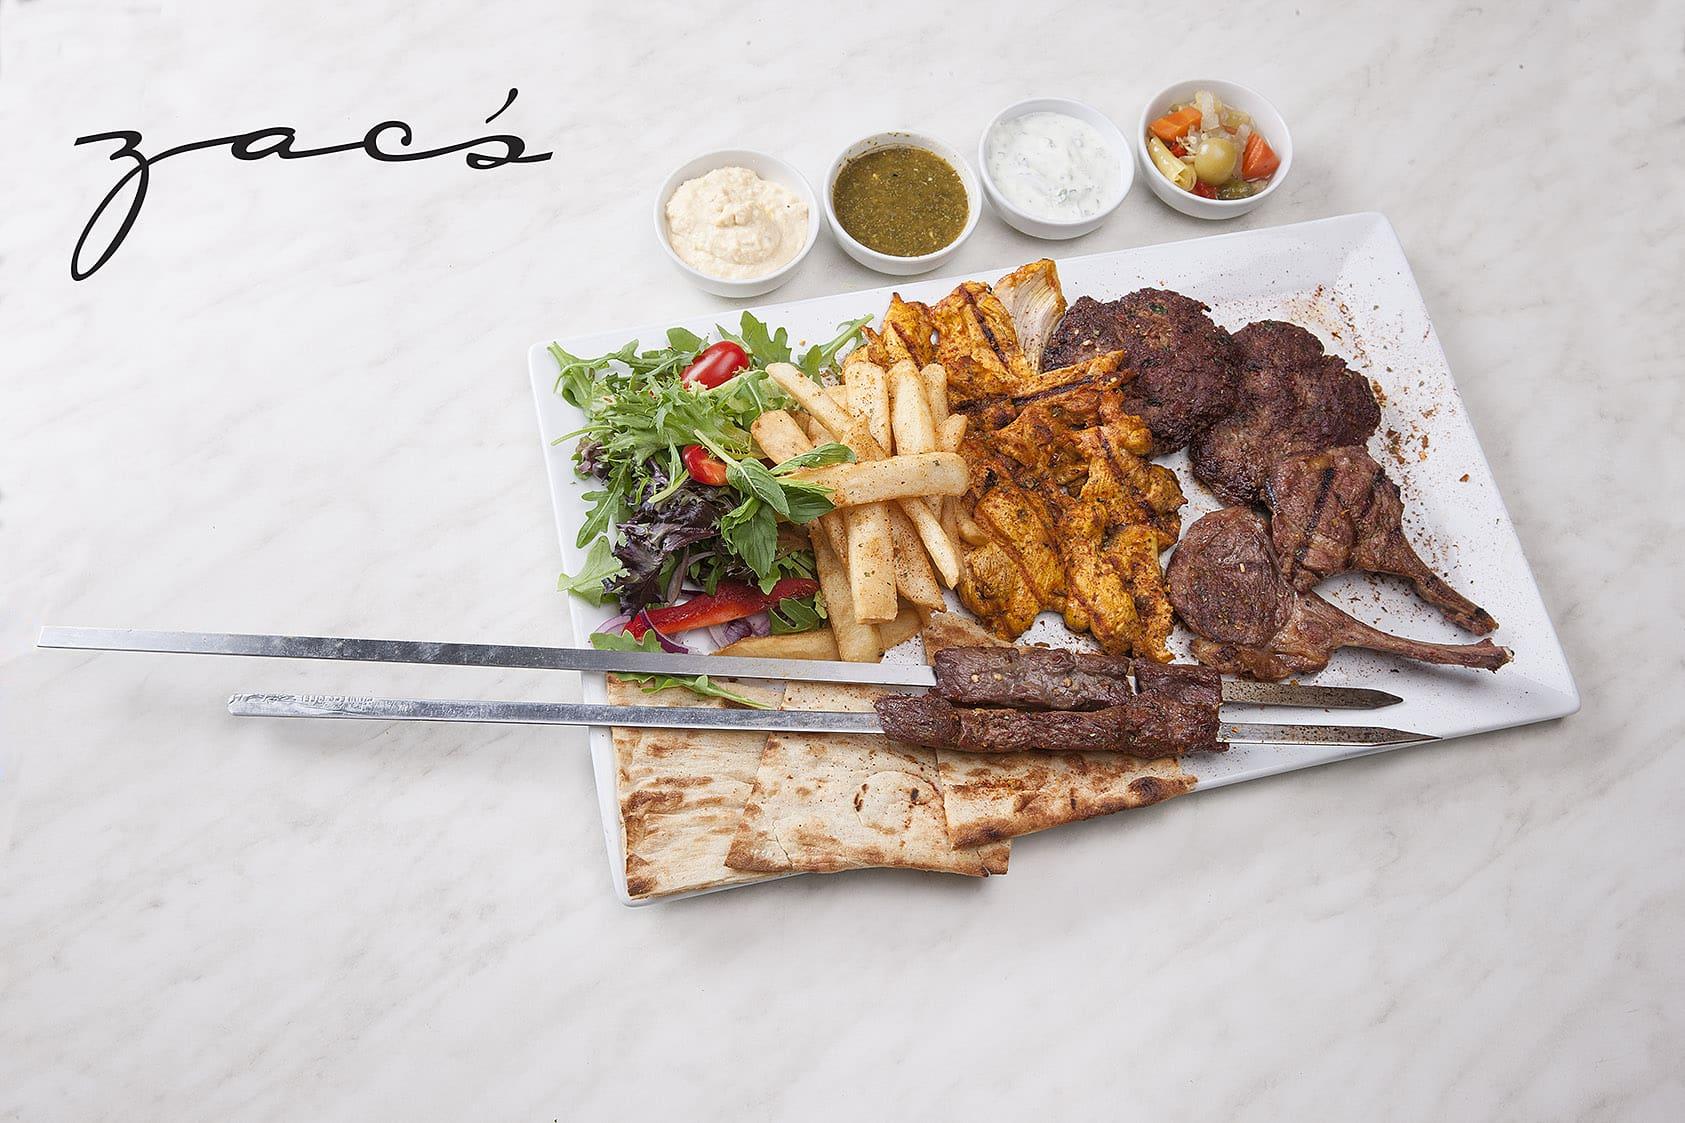 Zacs Great Food Restaurants In Bella Vista Afghani Steak